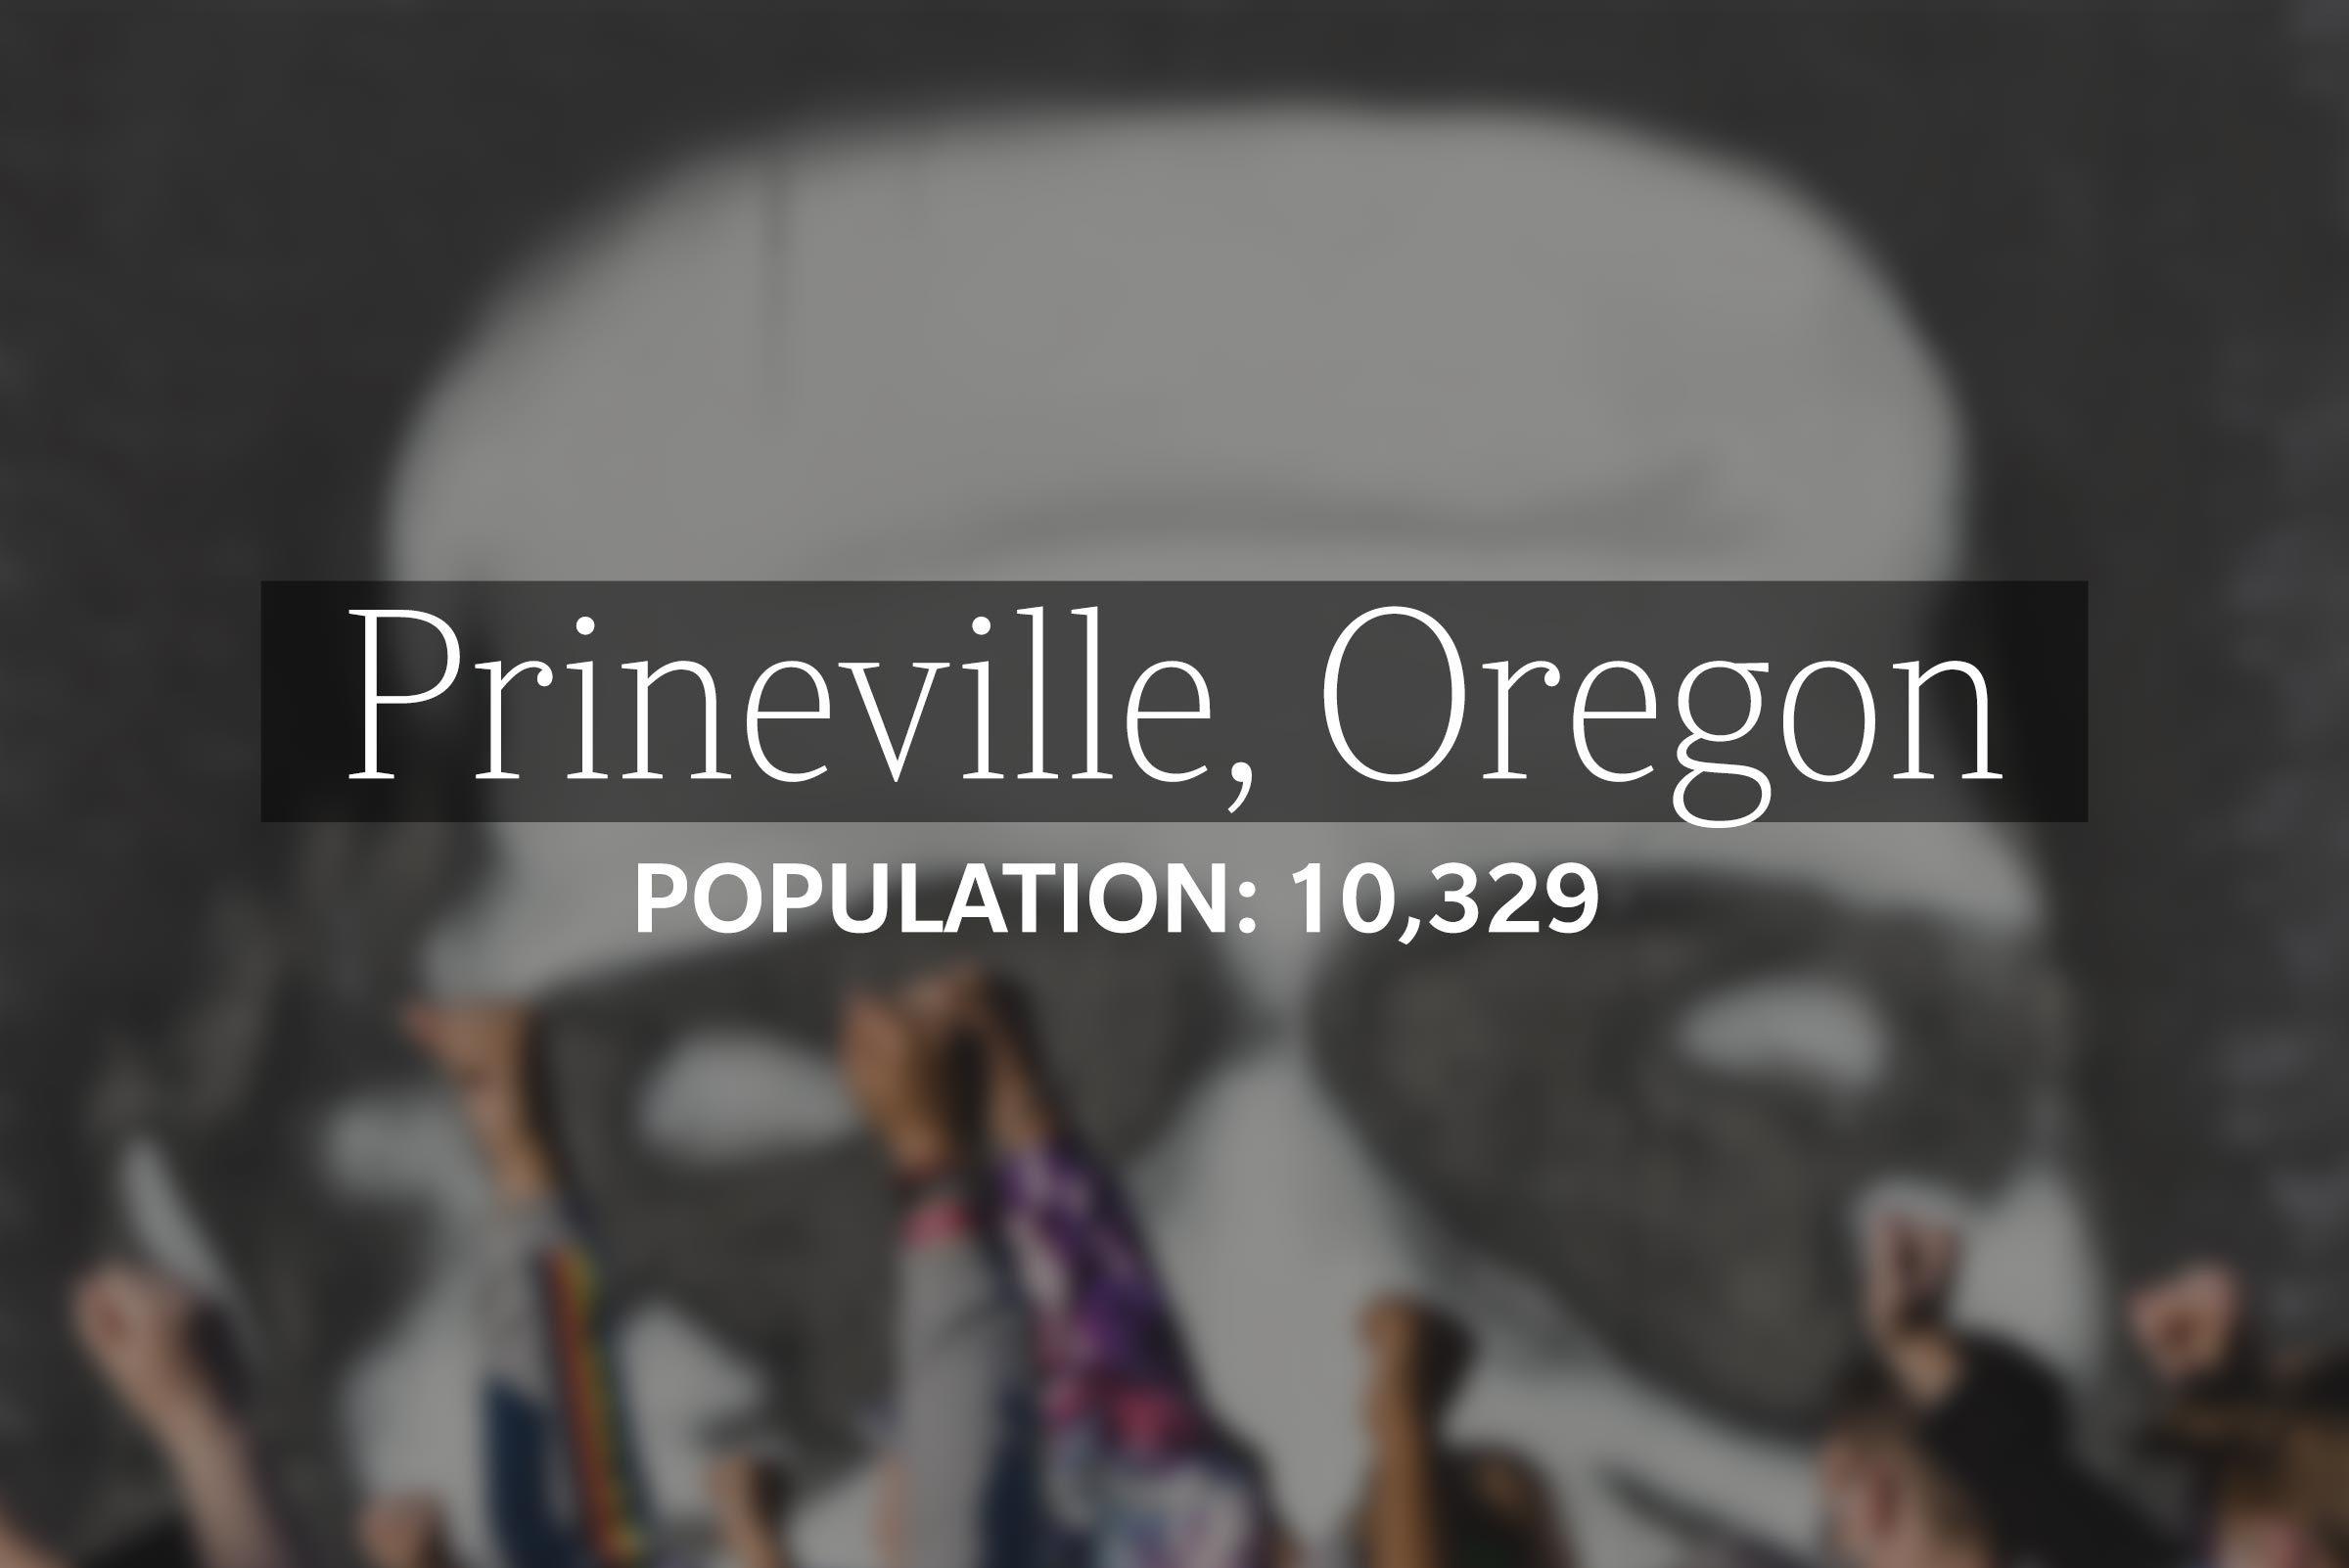 Prineville, Oregon (Population: 10,329)